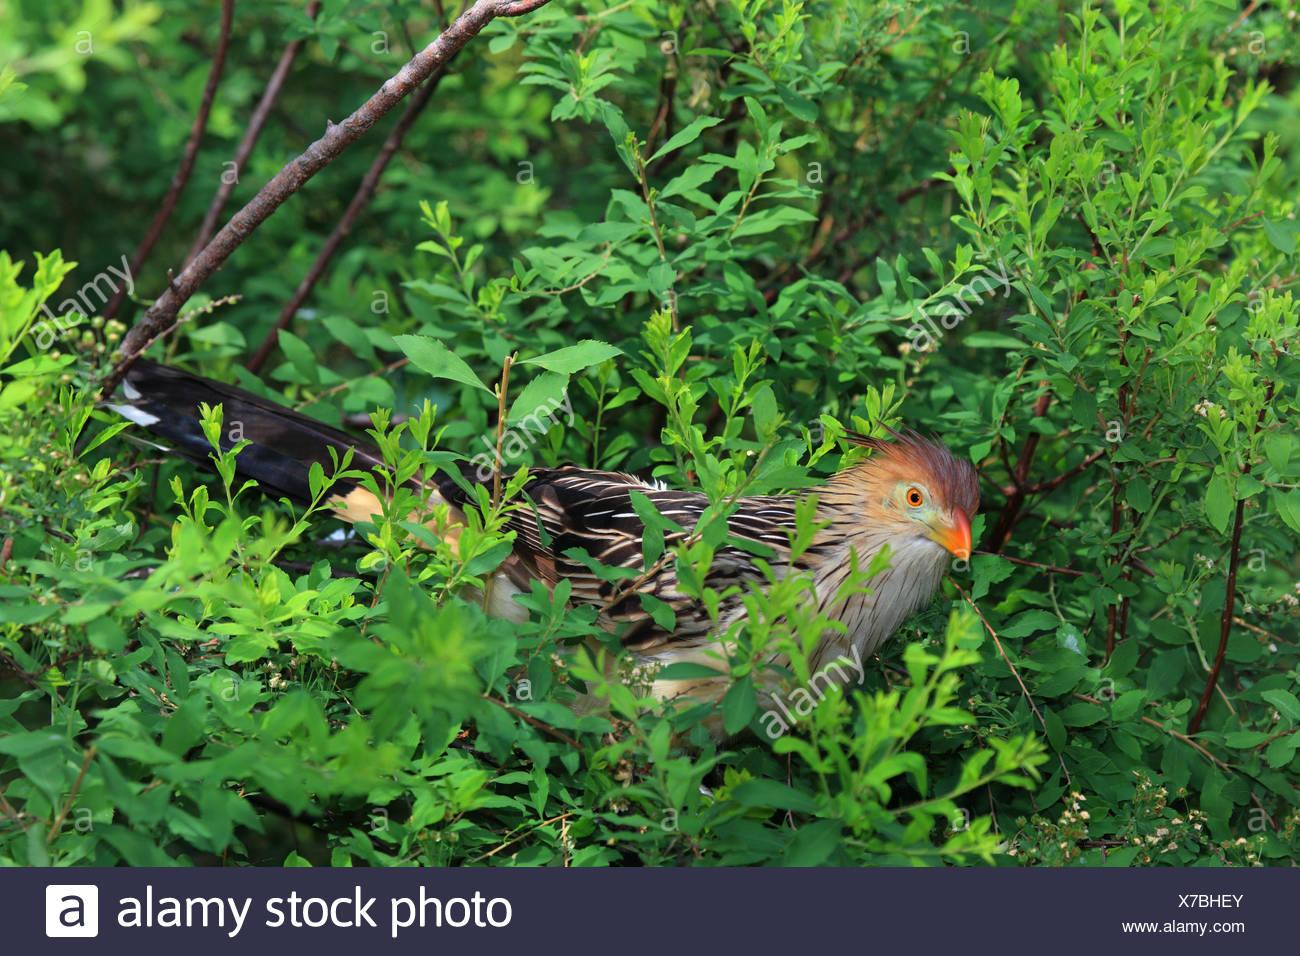 guira cuckoo (Guira guira), sitting in a tree - Stock Image